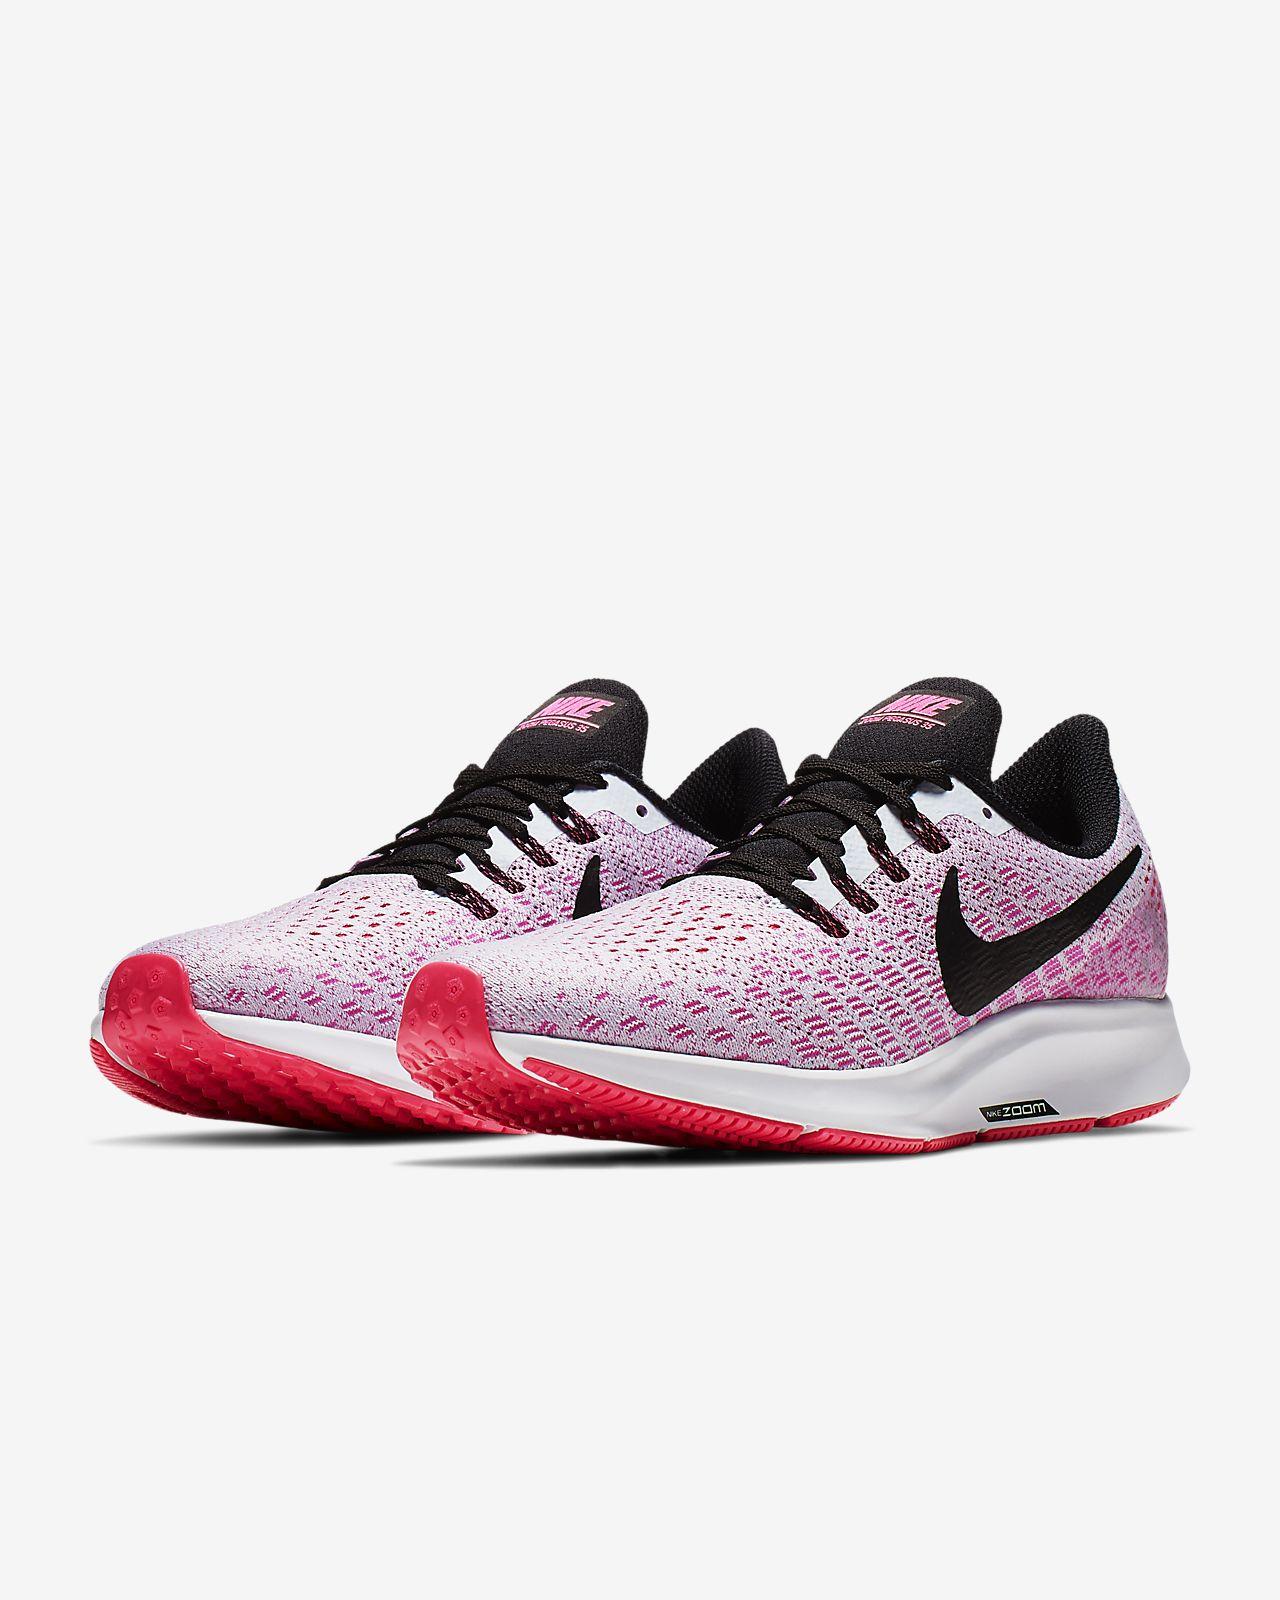 51705923c06c8 Nike Air Zoom Pegasus 35 Women s Running Shoe. Nike.com AU